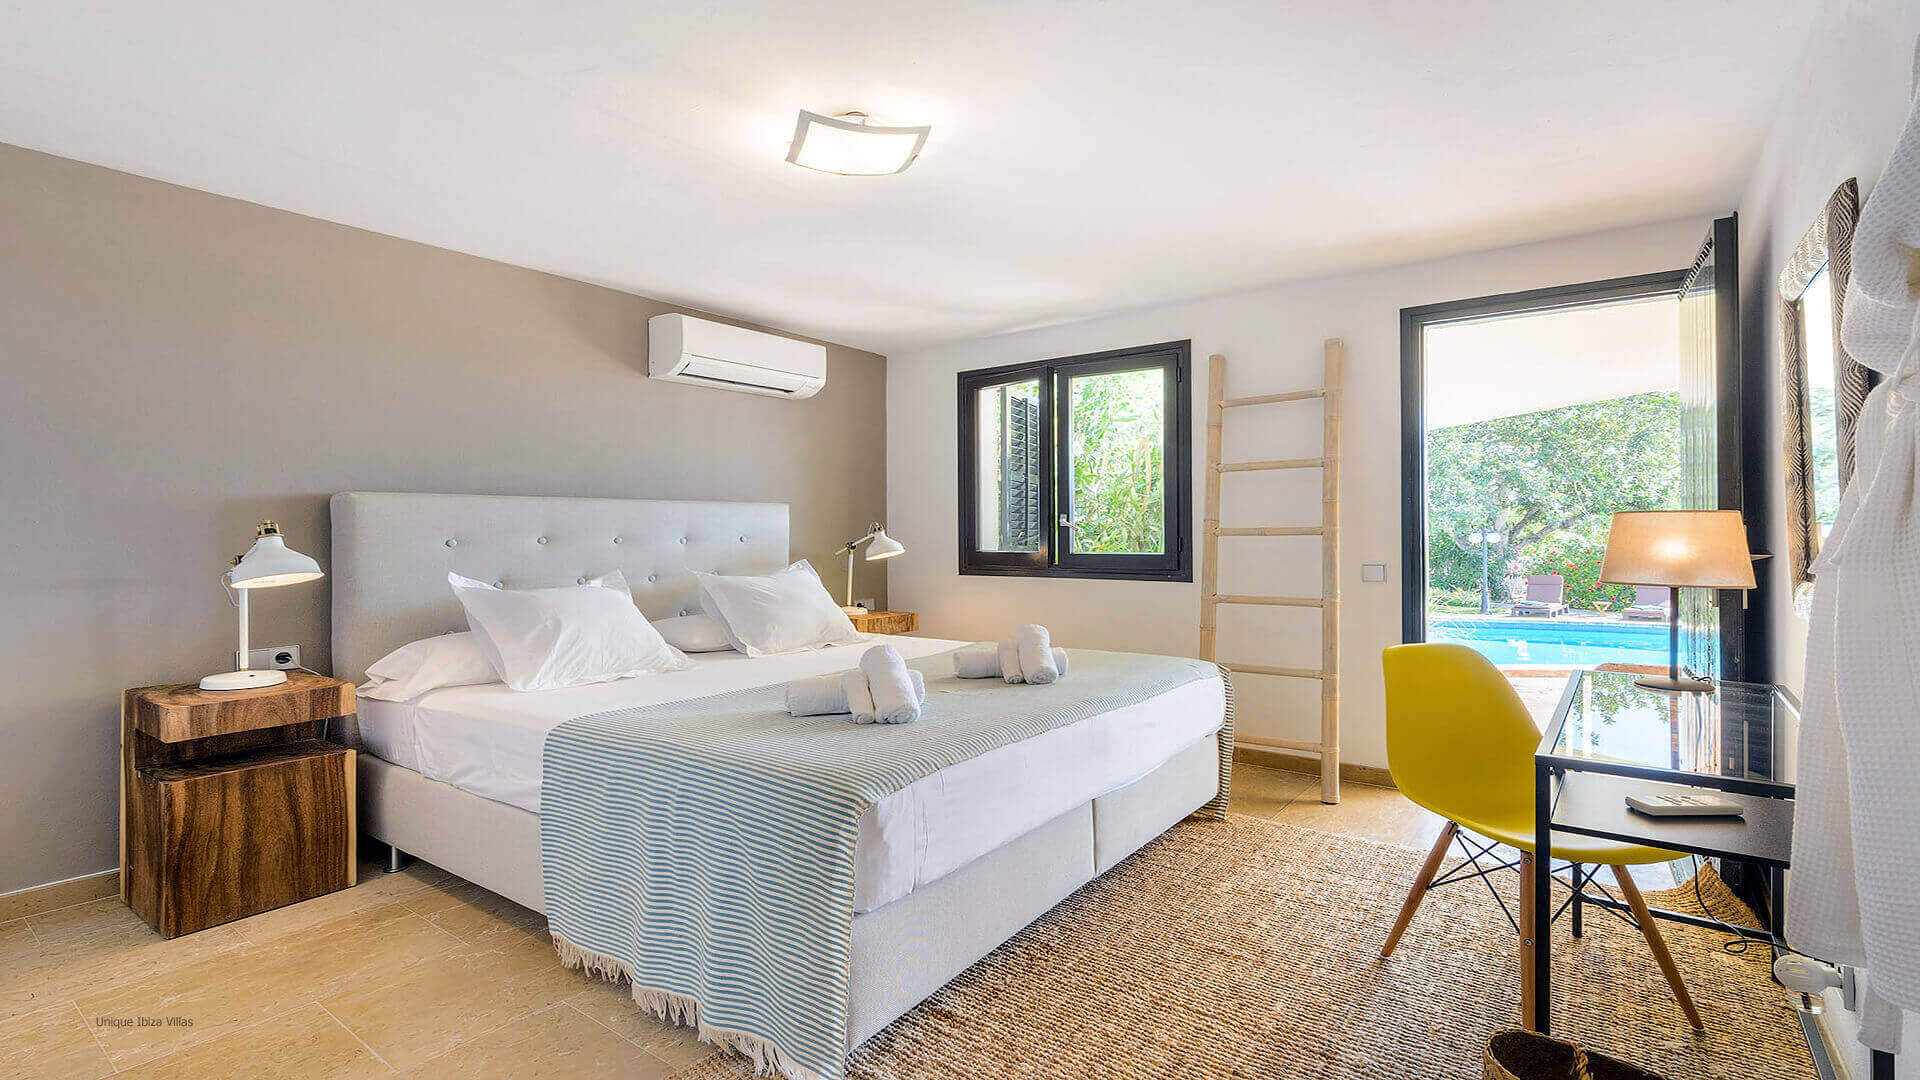 Villa Flor Ibiza 36 Bedrooom 2